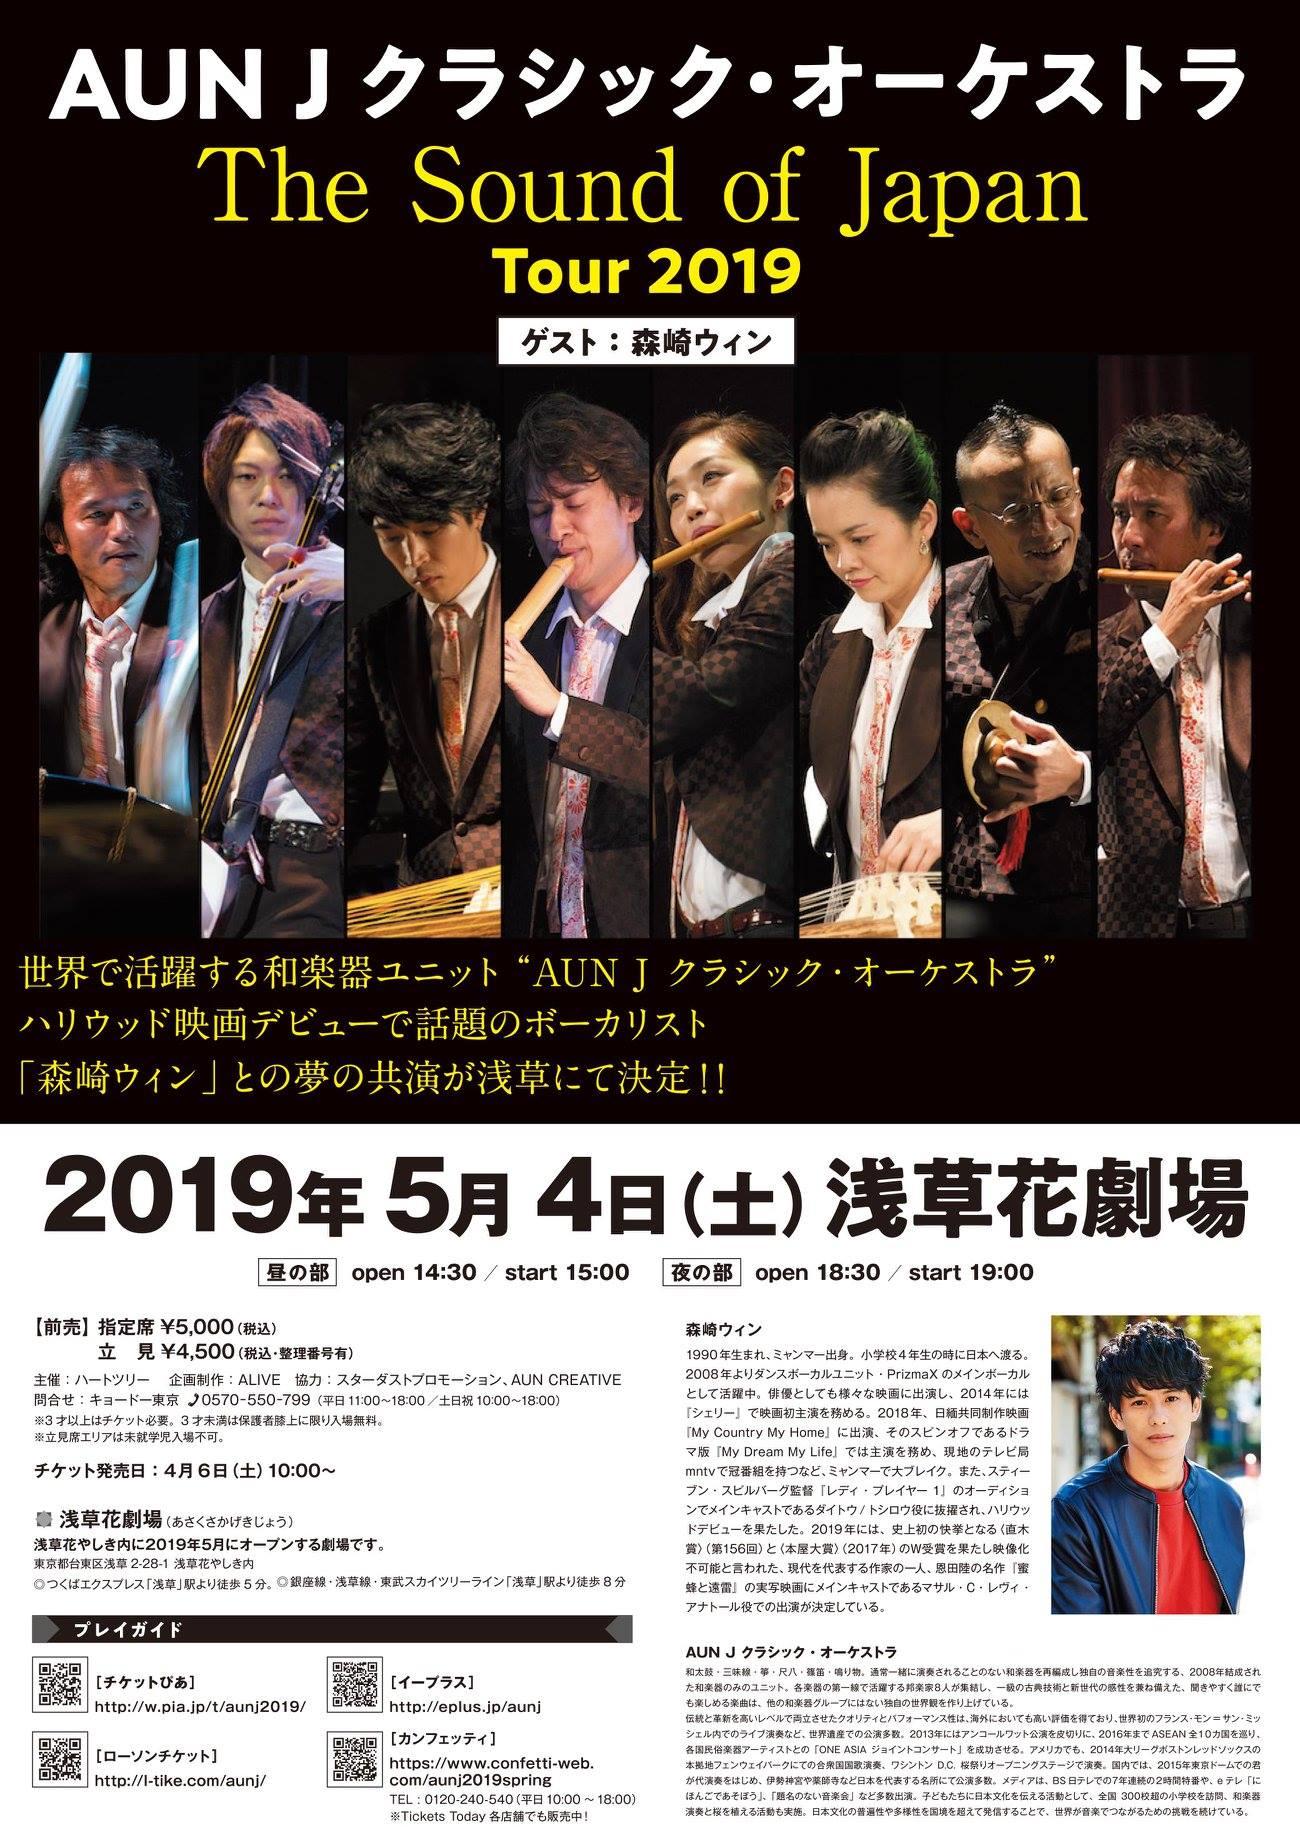 AUN J クラシック・オーケストラ The Sounds of Japan Tour 2019 夜の部